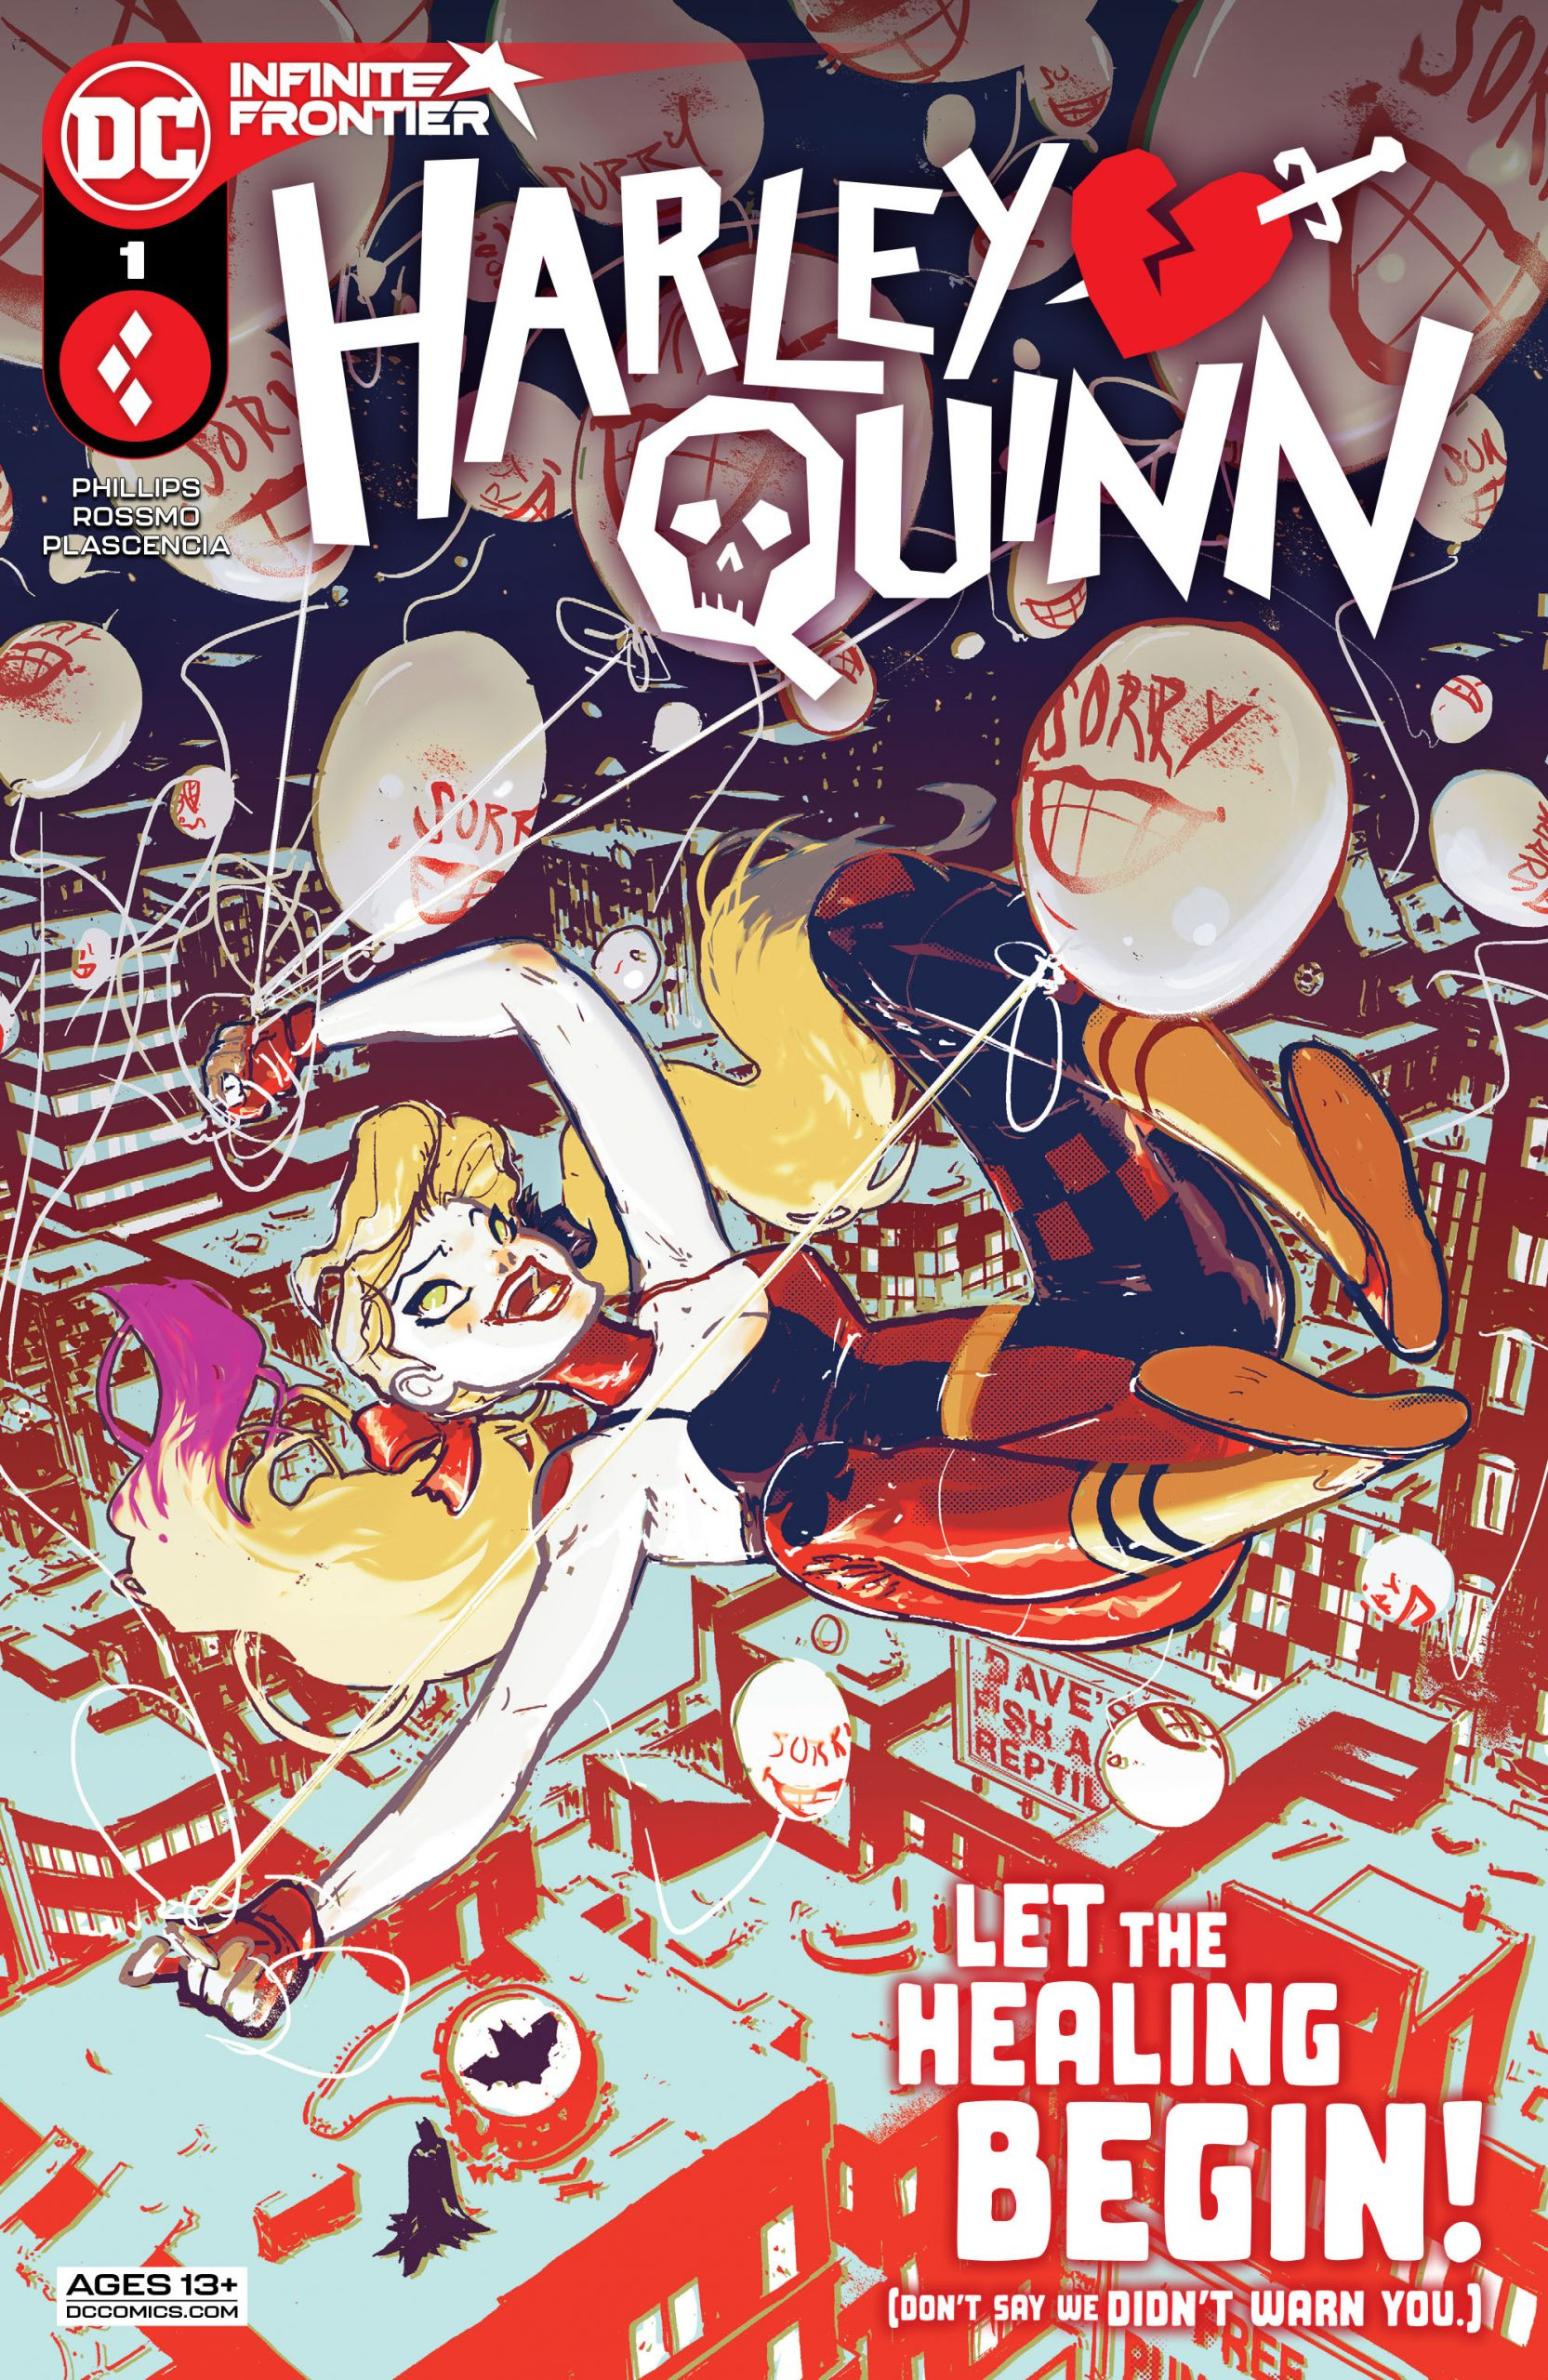 Harley Quinn #1 | DC Infinite Frontier